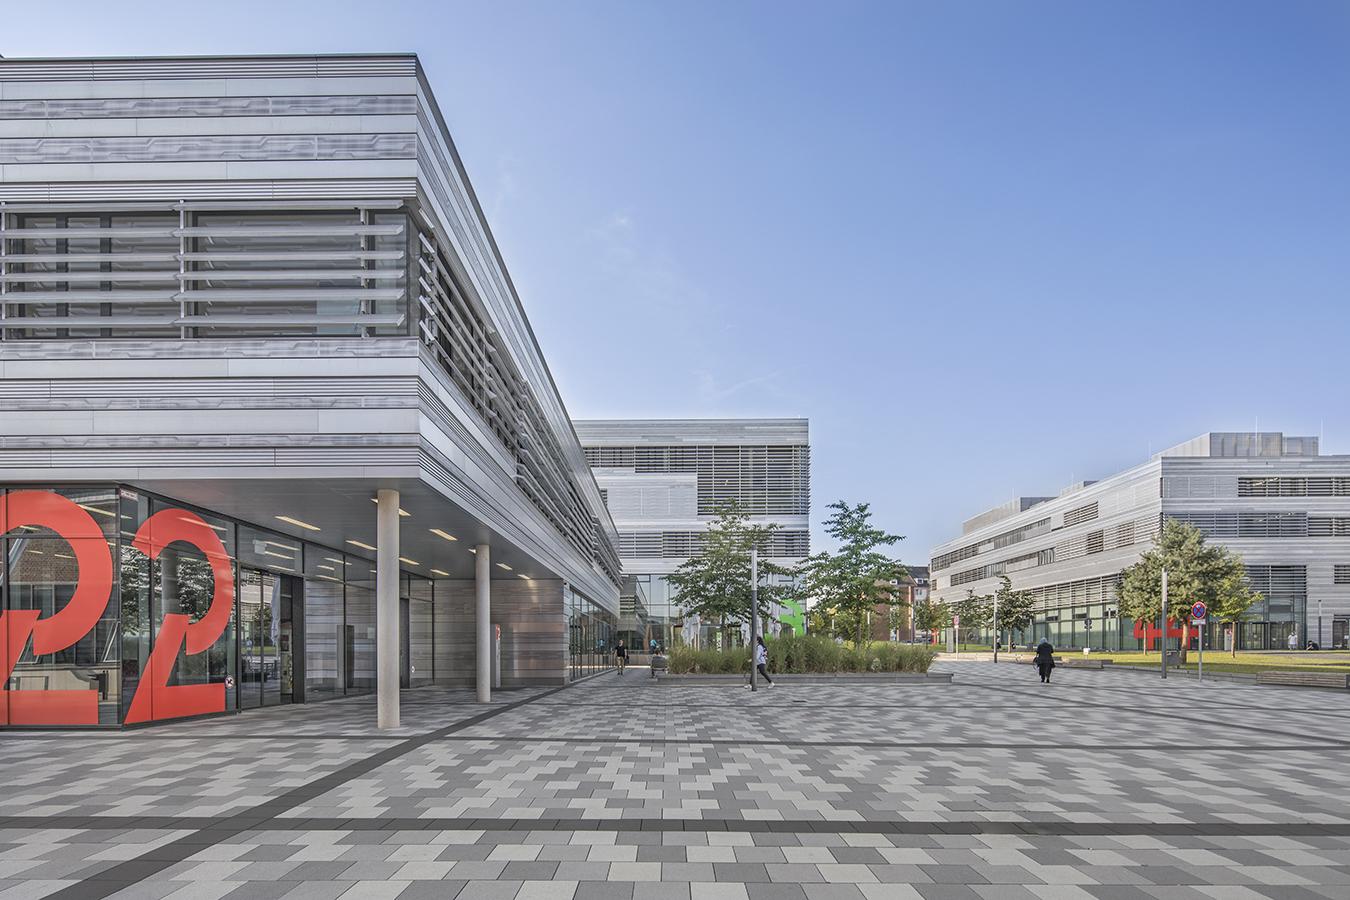 hochschule dsseldorf - Fh Dsseldorf Bewerbung